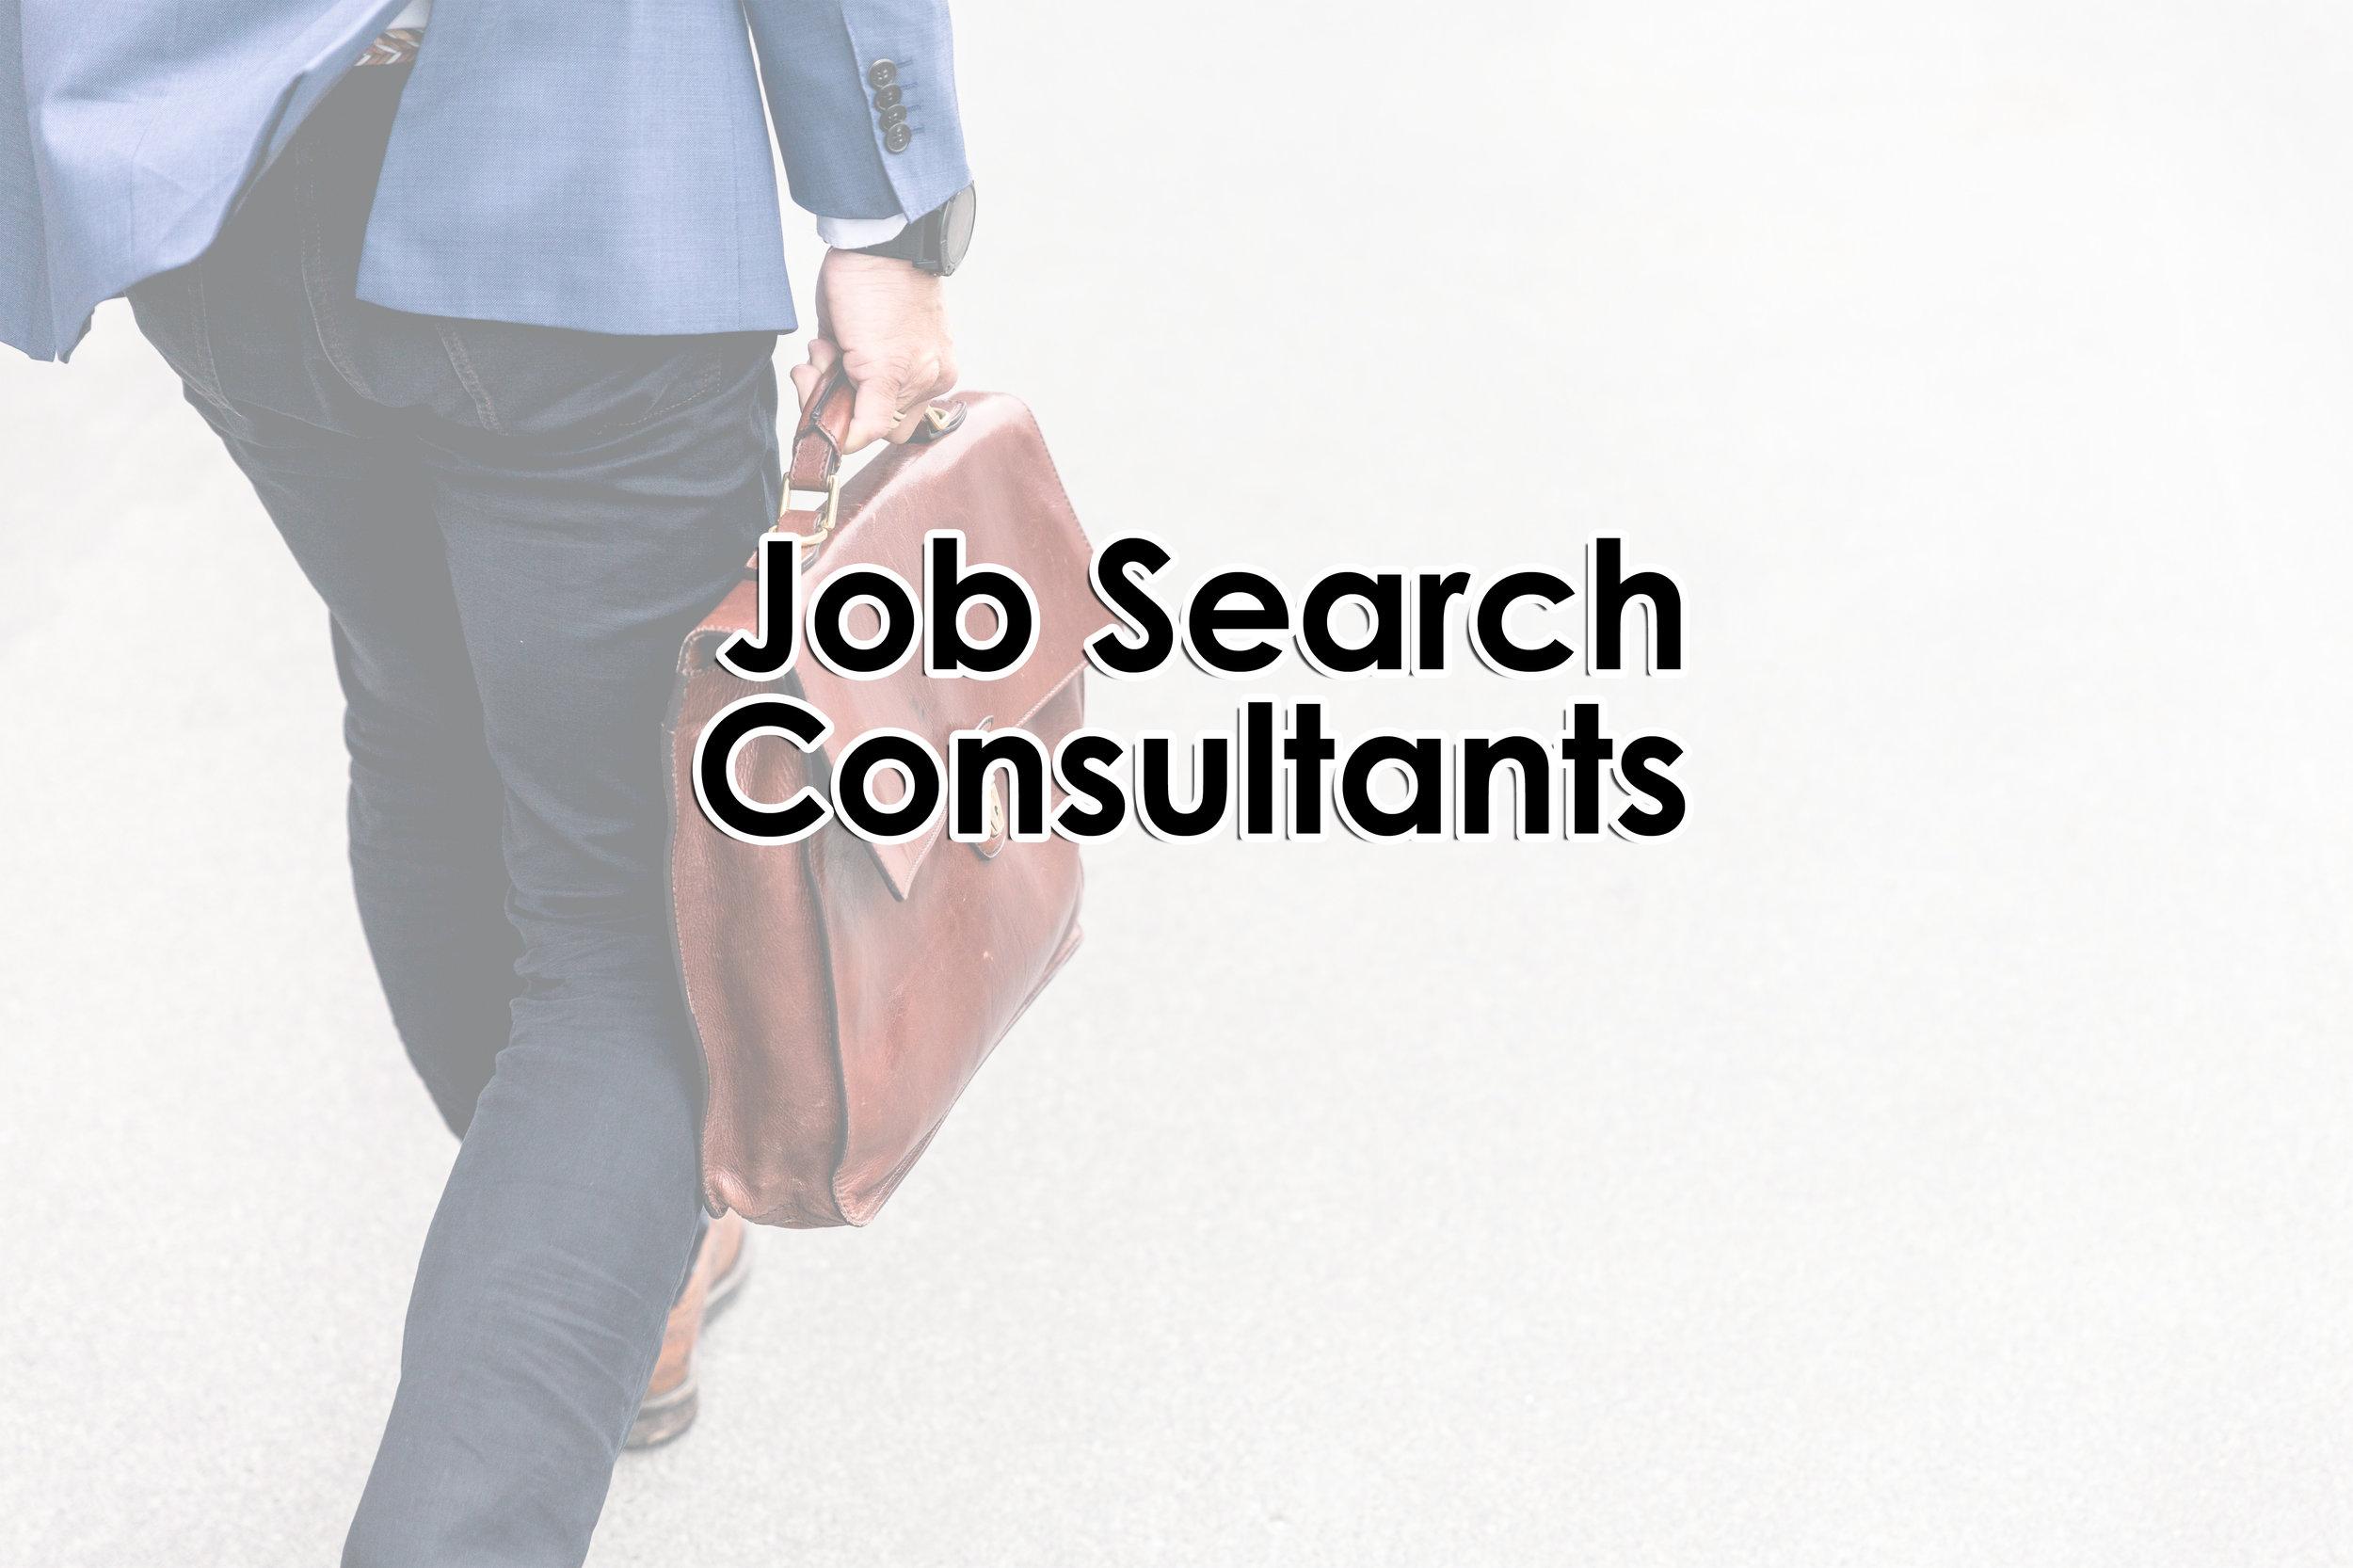 Job Search Consultants